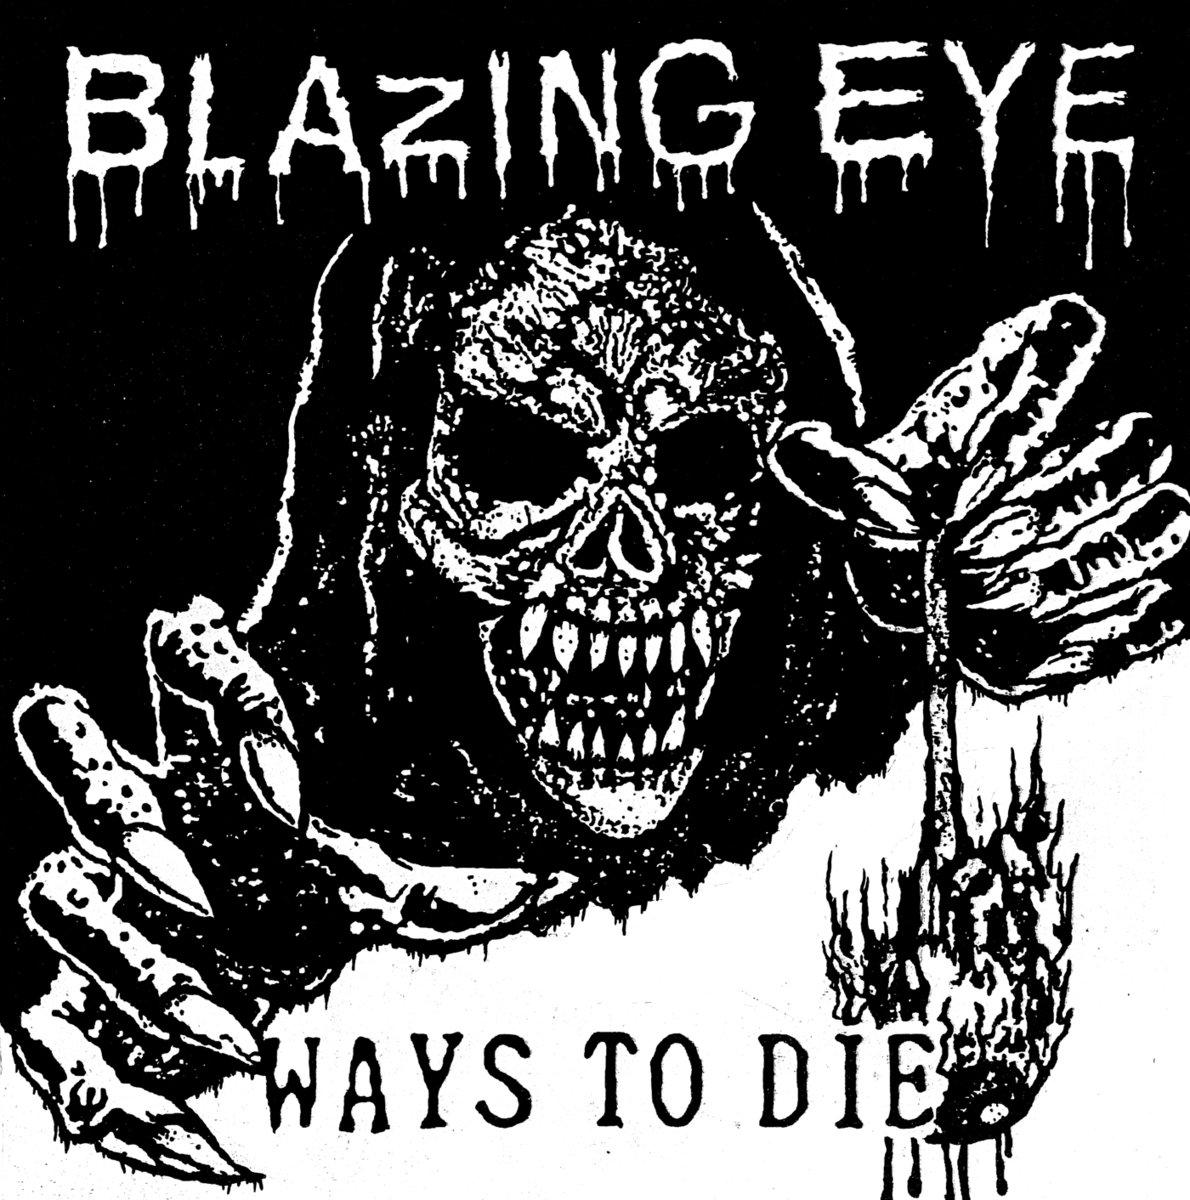 Blazing Eye - Ways to Die 7